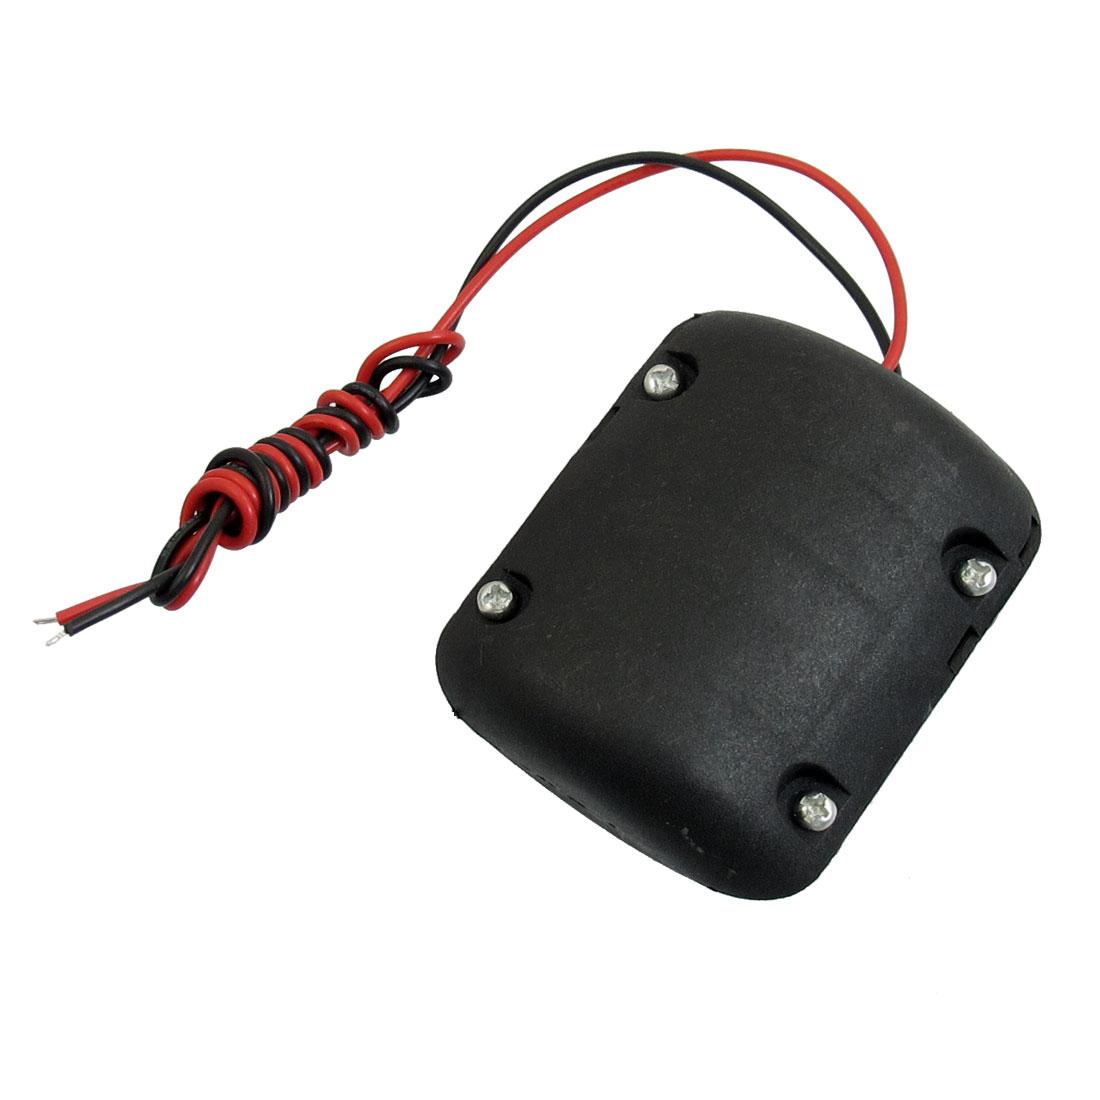 8V 4100 RPM 0.15A DC Black Box Vibration Magnetic Gear Box Motor